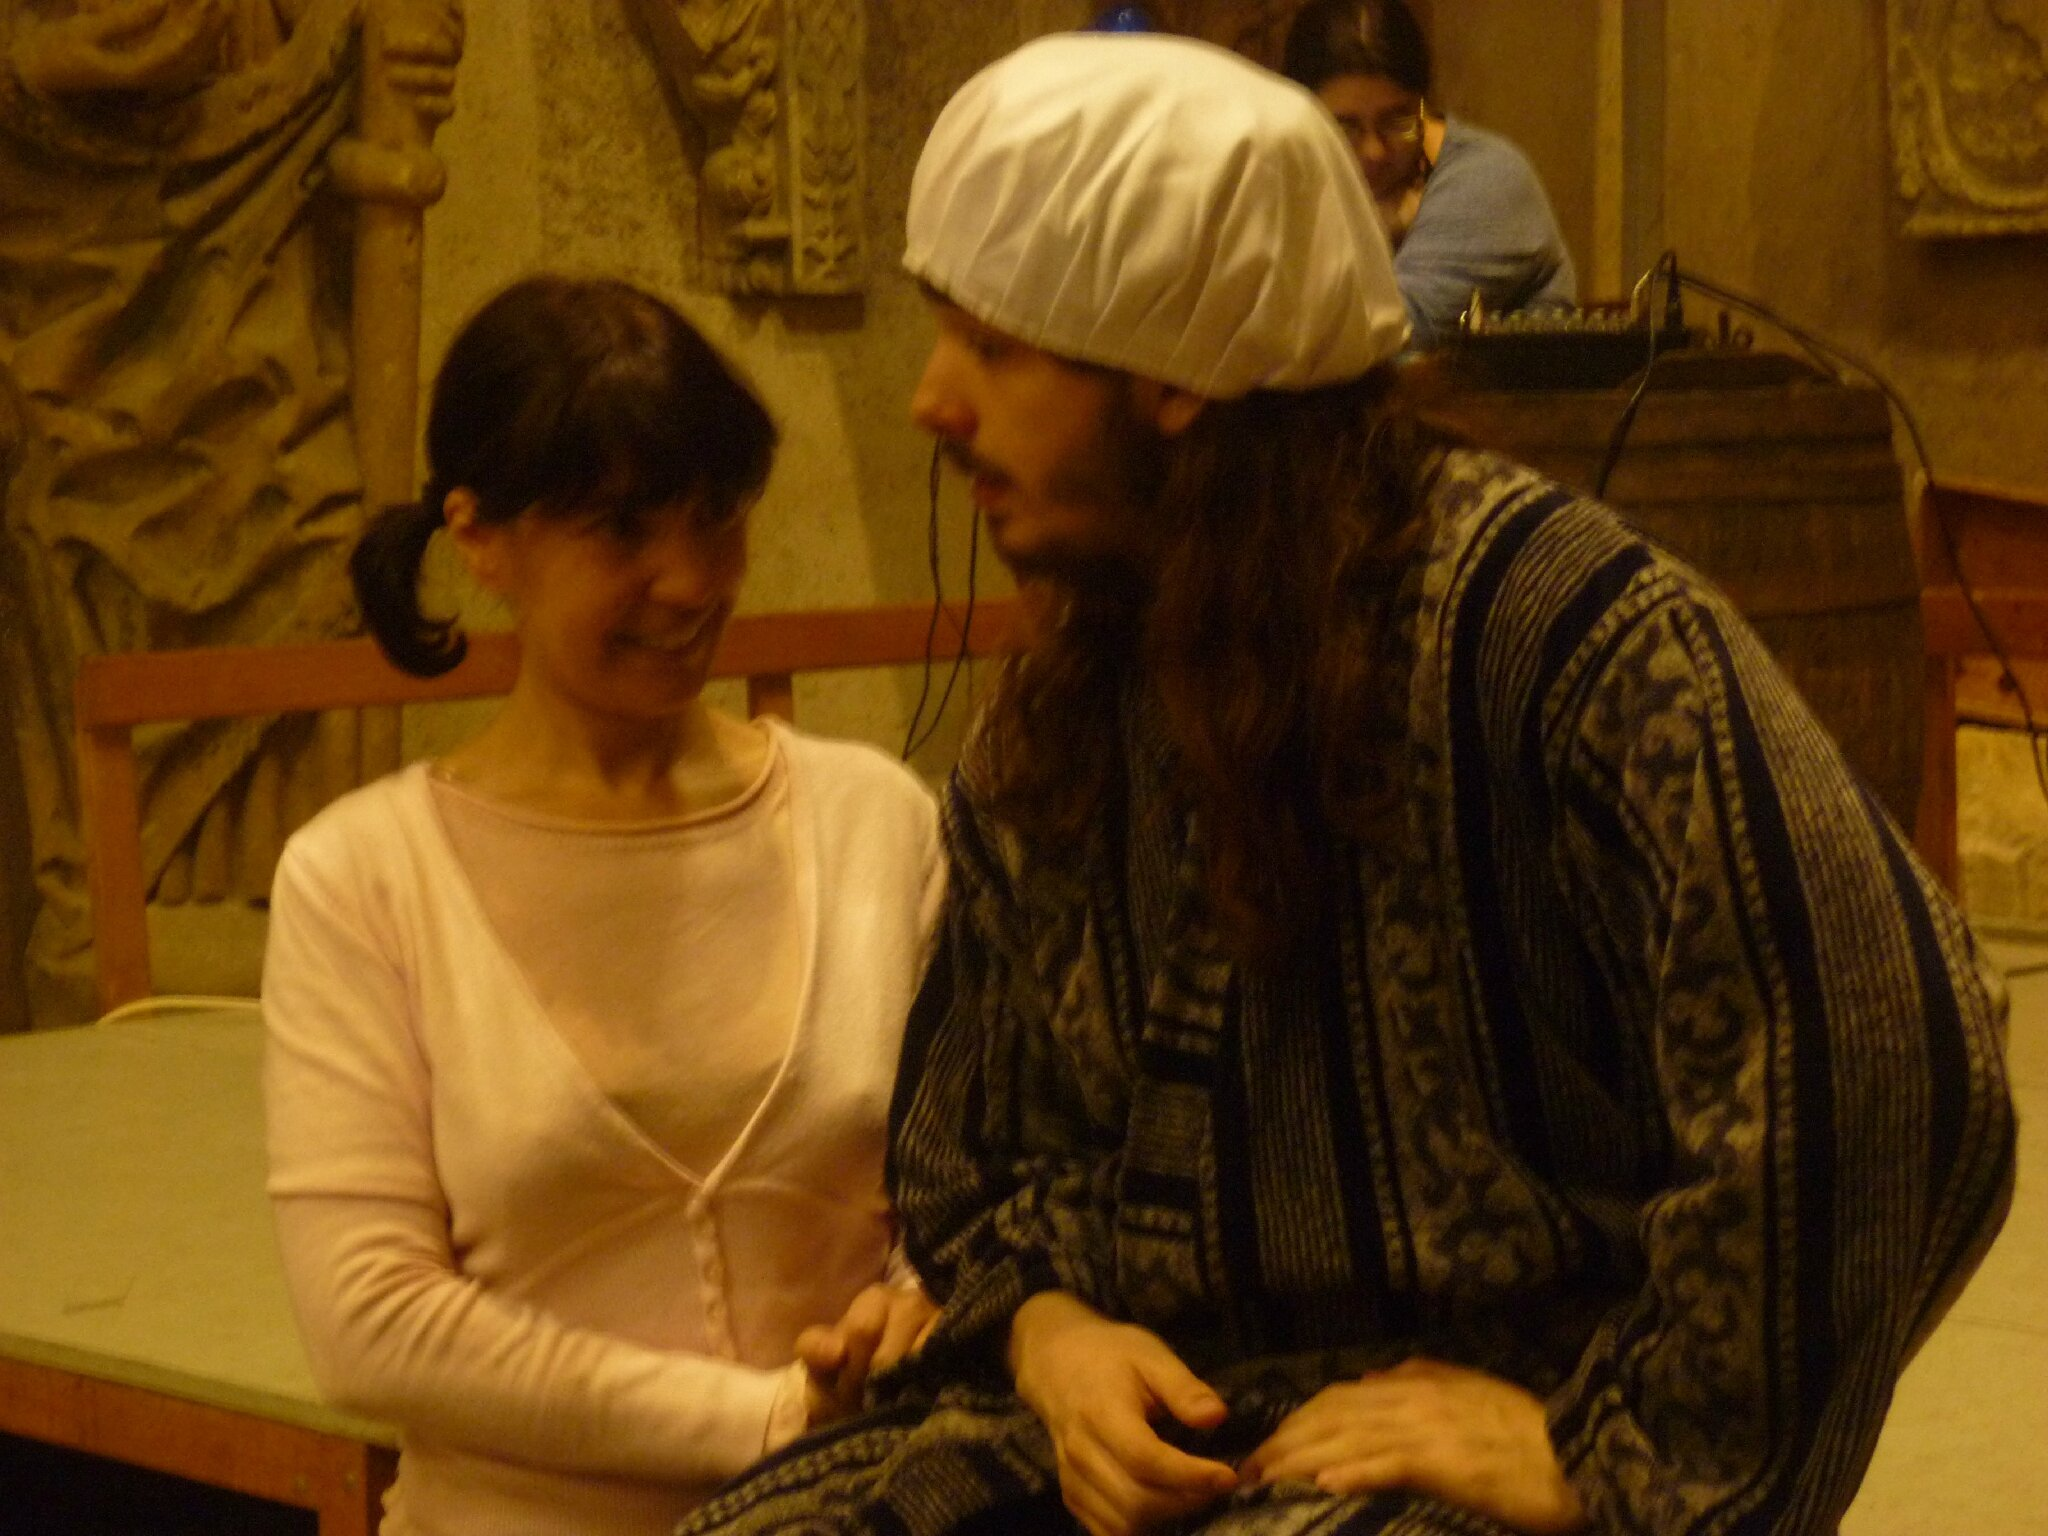 Jean baptiste si tu savais la muse ment for Jean d ormesson si tu savais najat